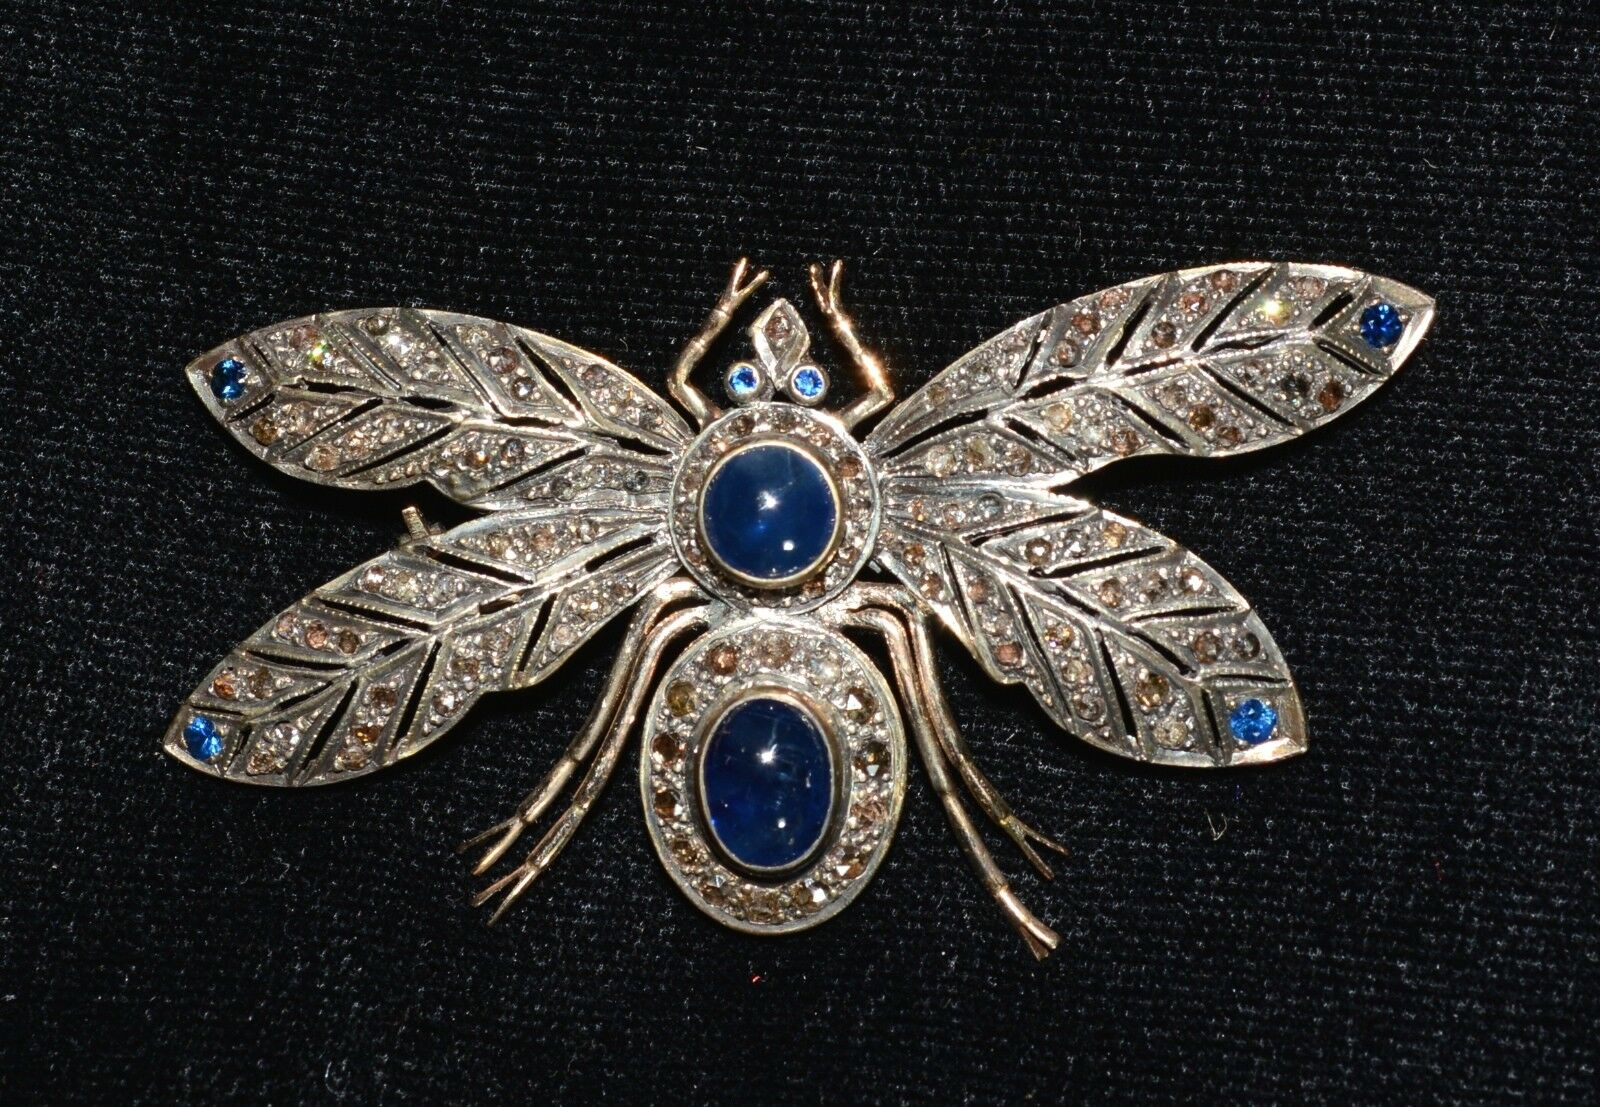 VINTAGE 14KT 12 CARATS BURMA blueE SAPPHIRE DIAMOND WASP BROOCH PIN